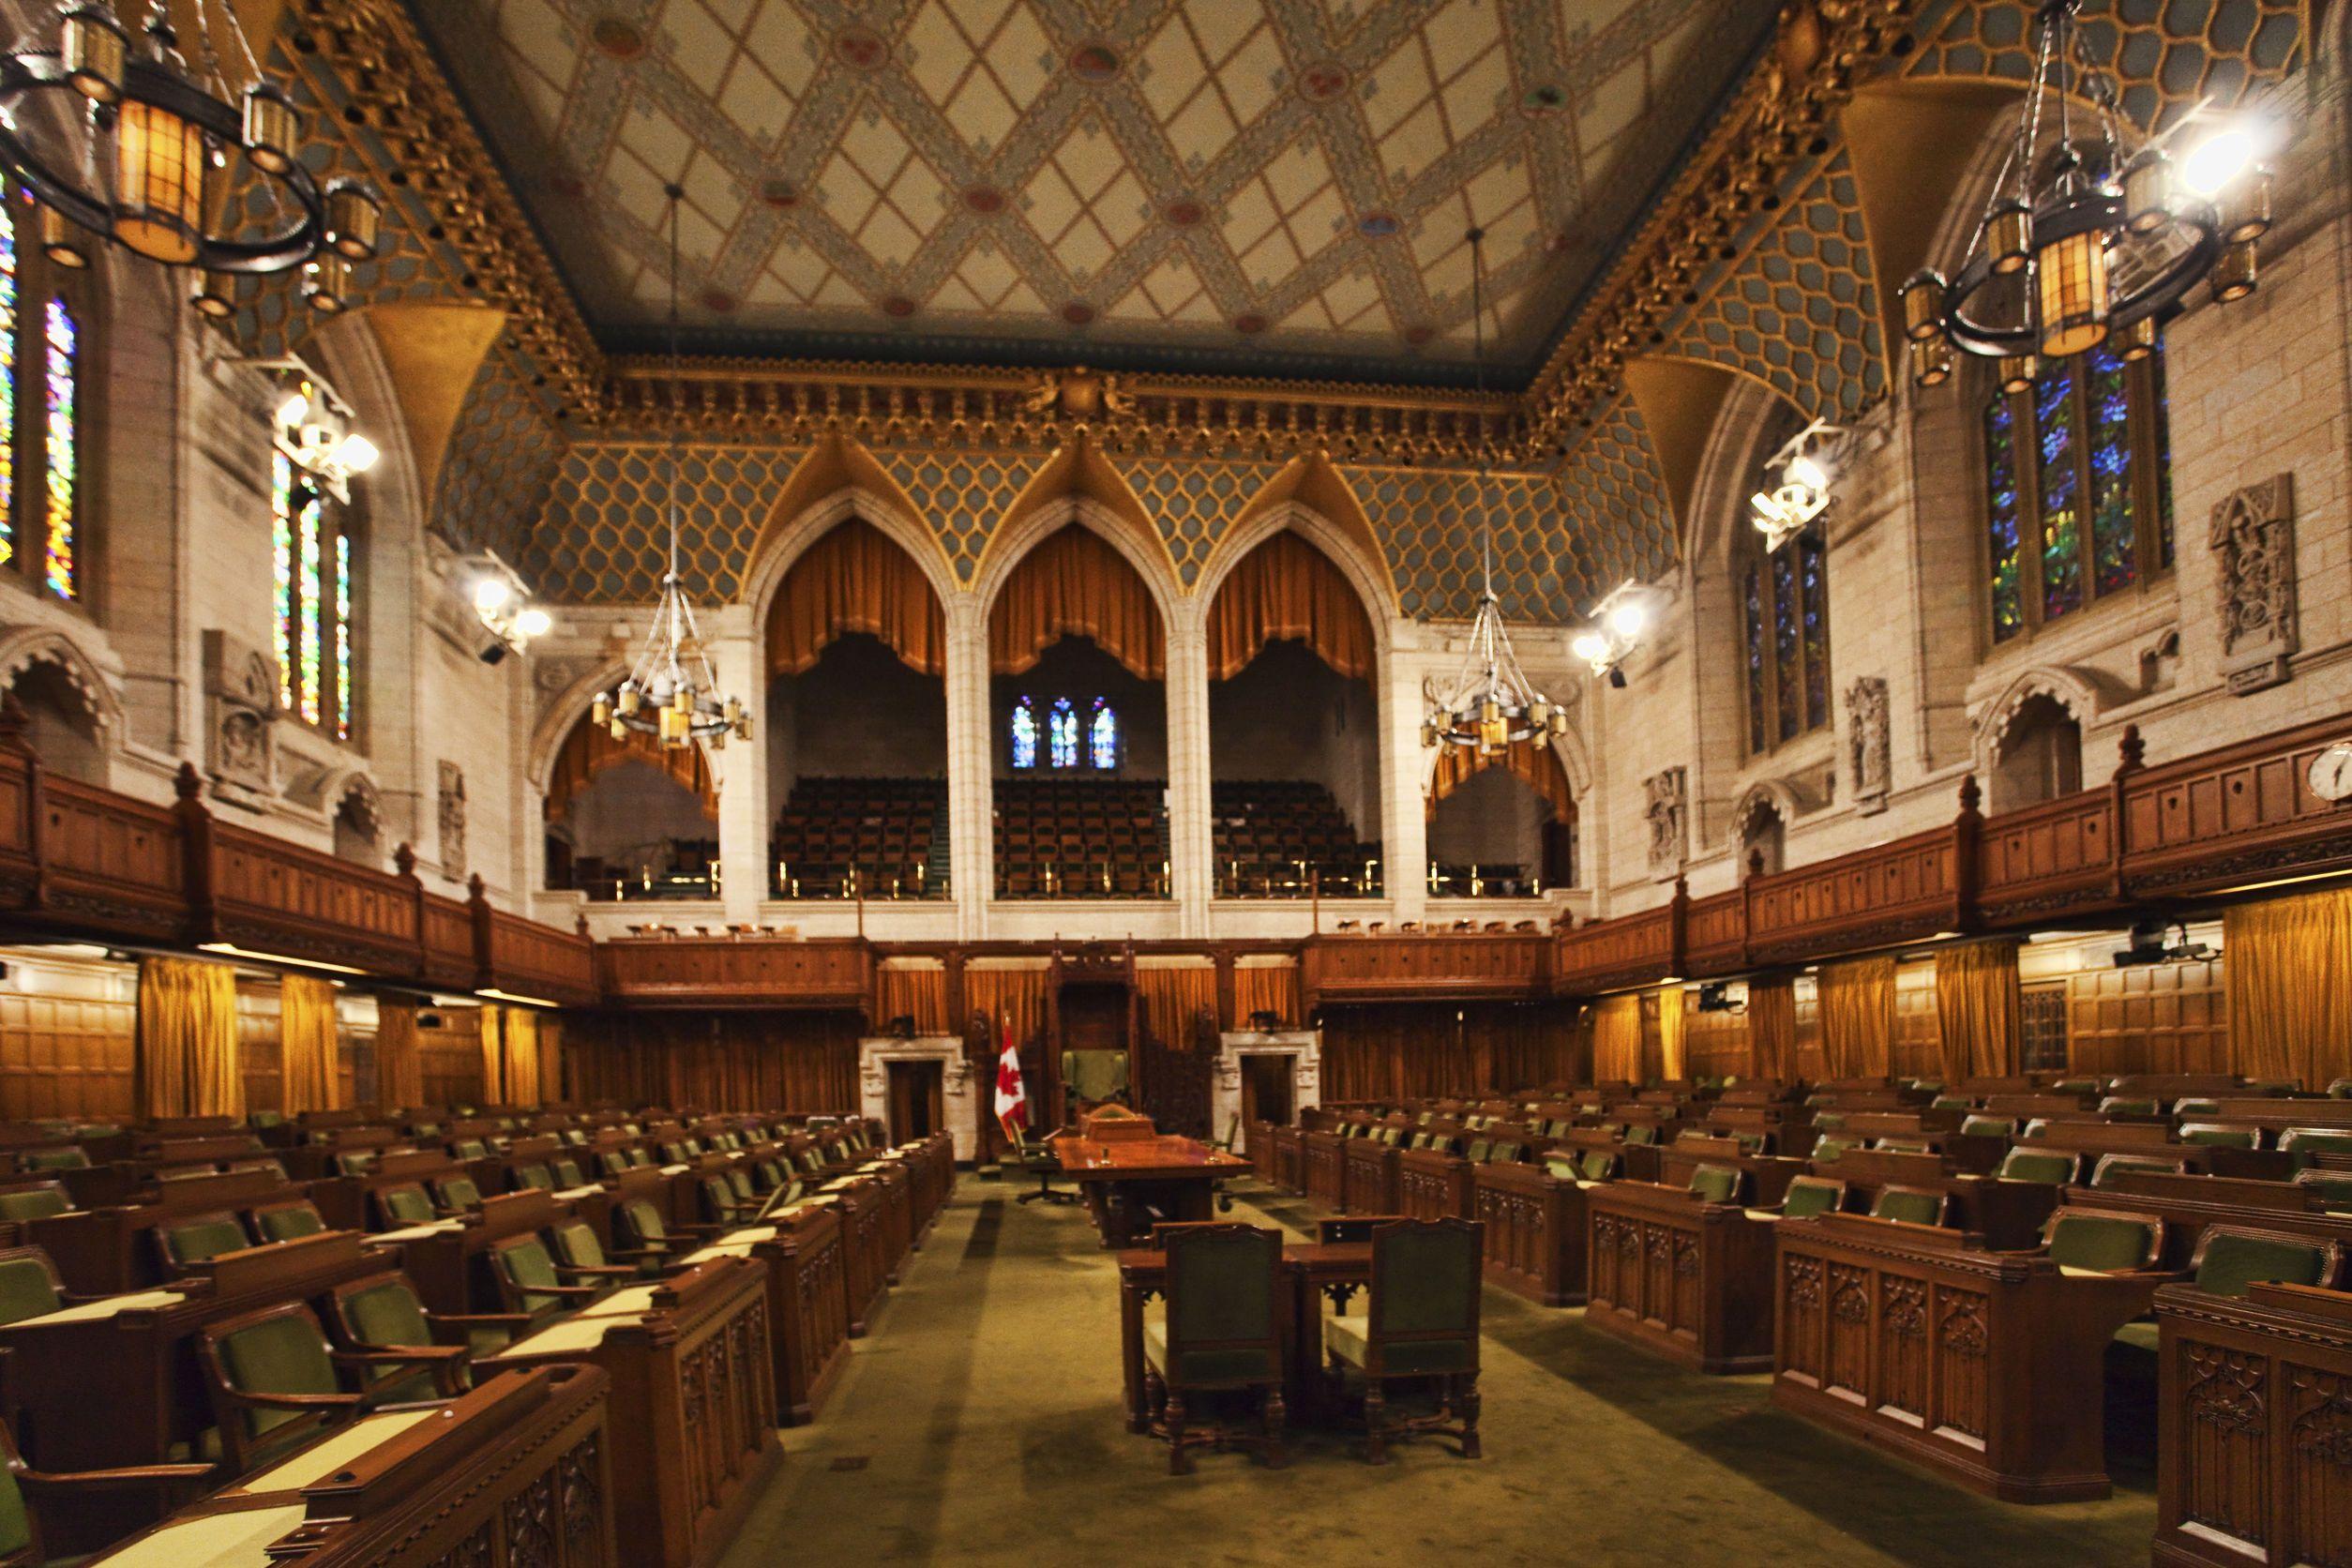 Canada cannabis law amendment, Canada's ruling party rejects controversial amendments to cannabis bill